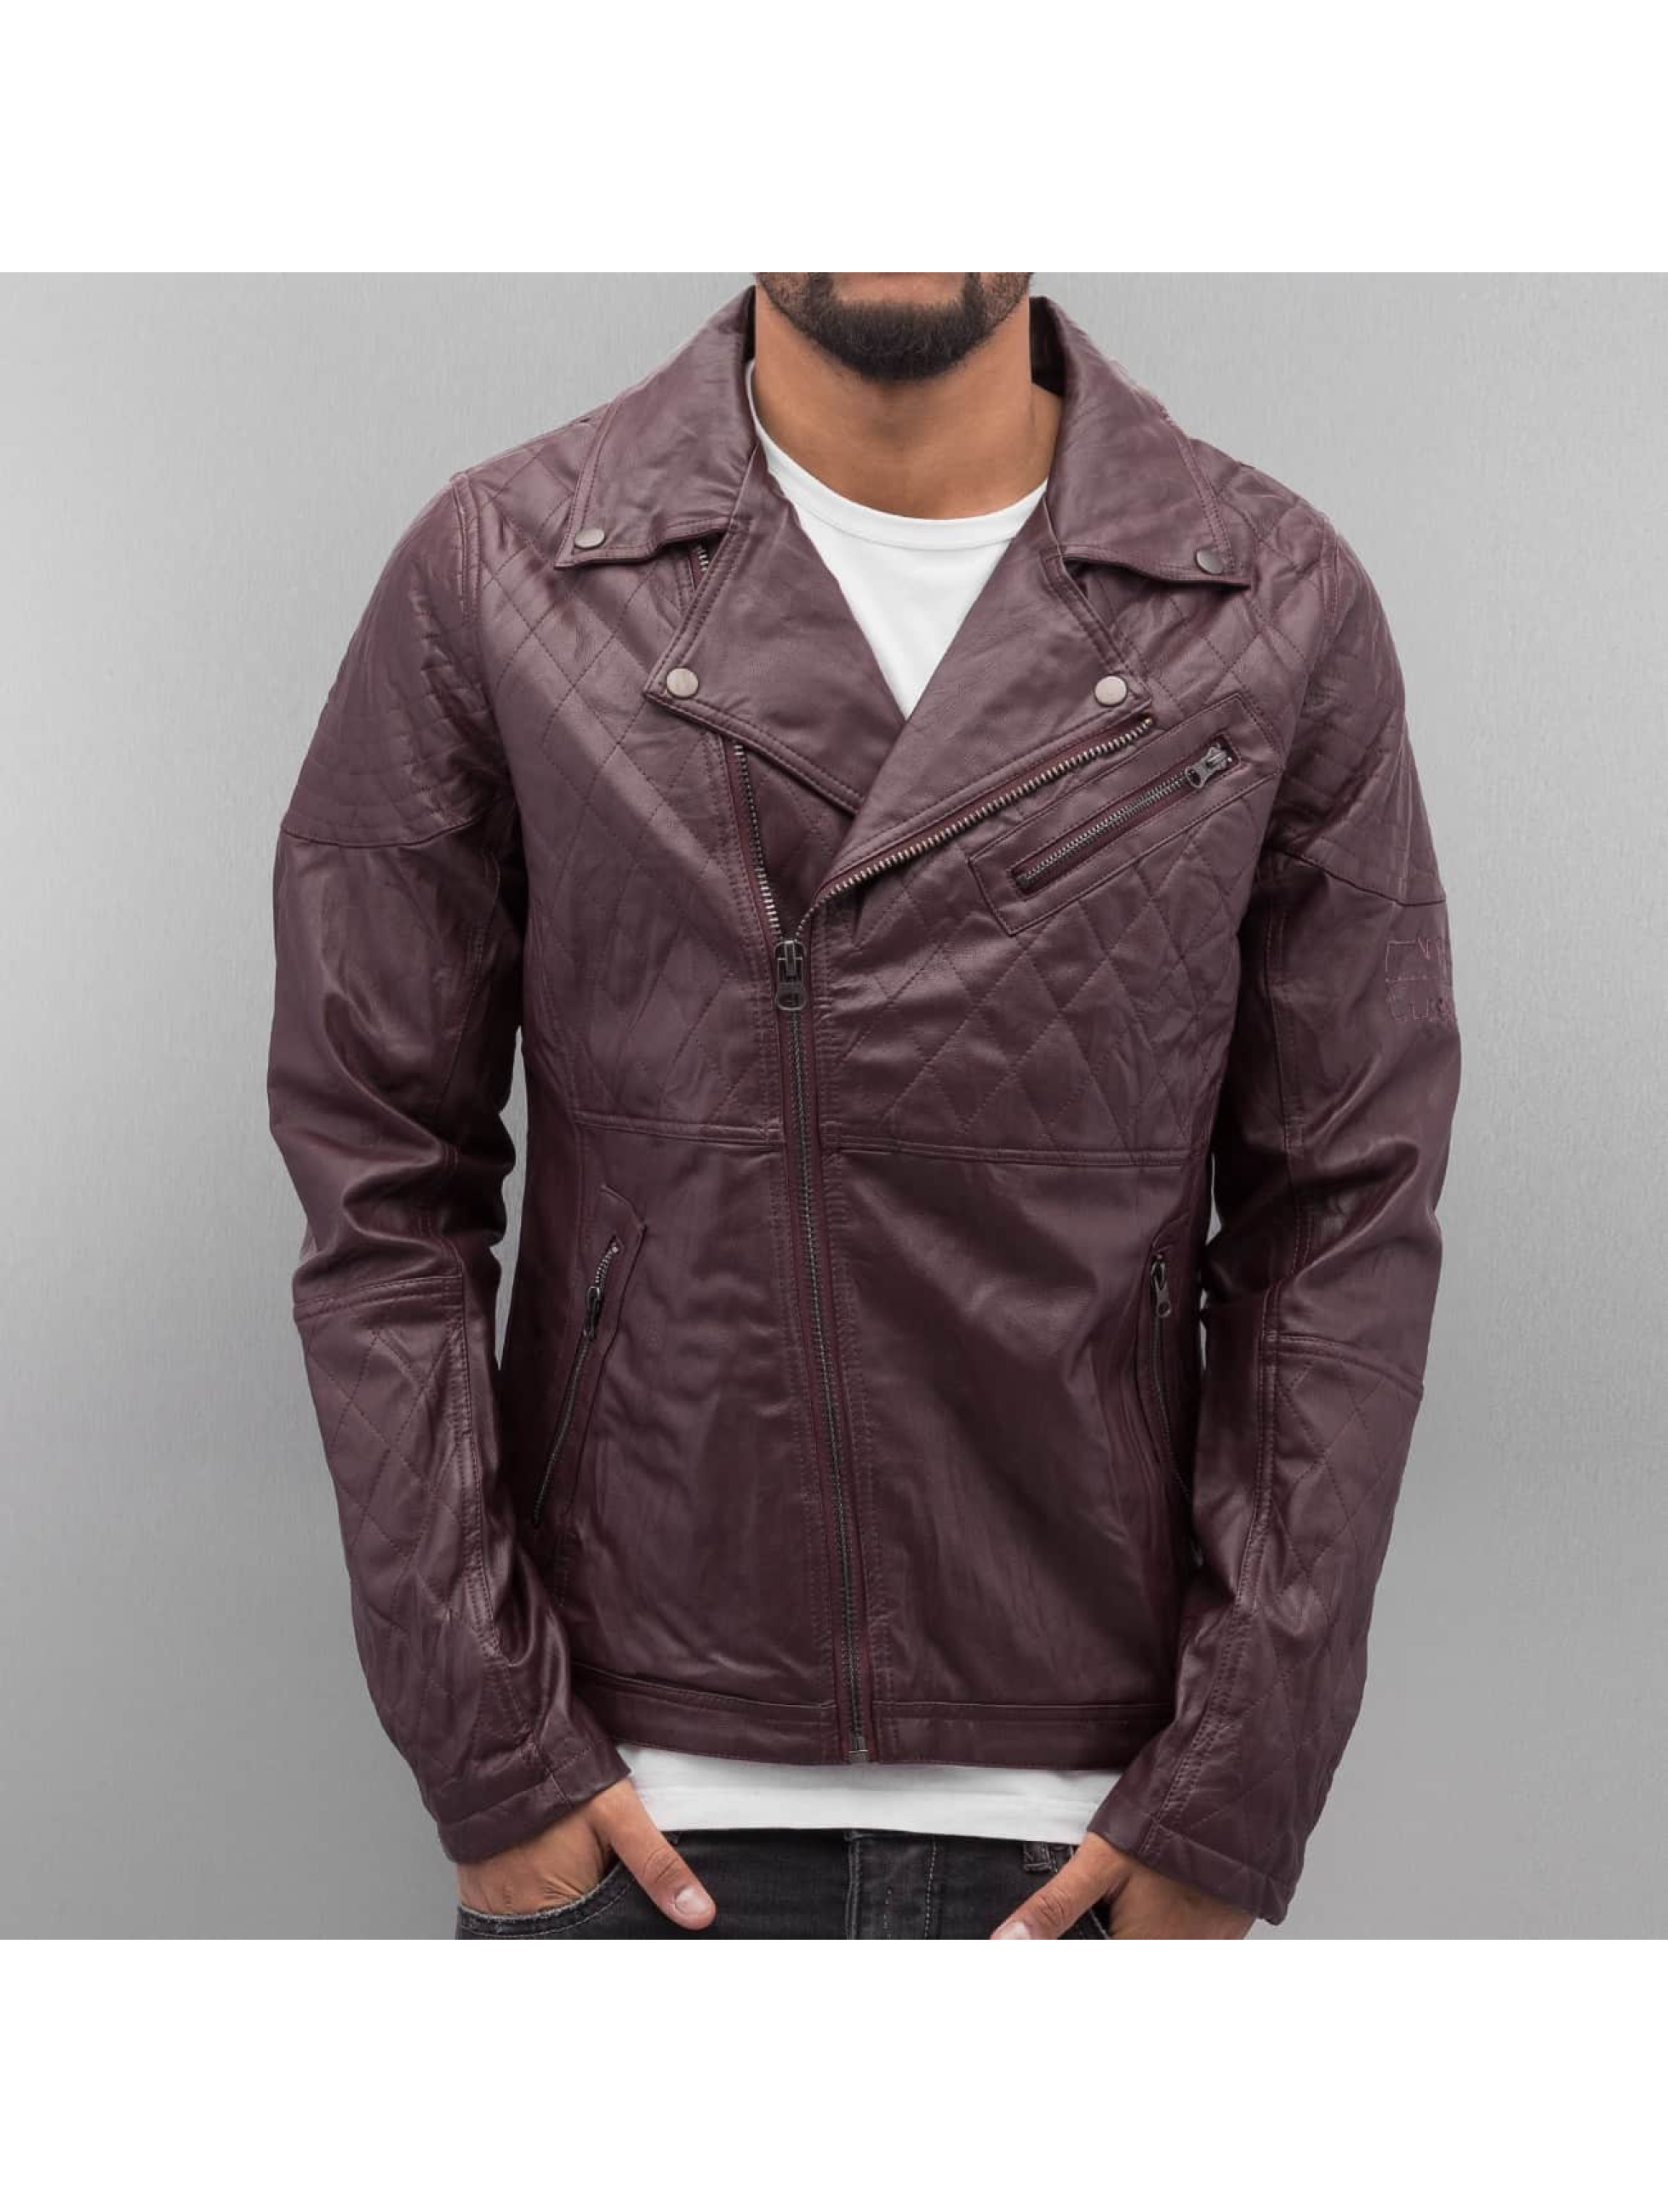 VSCT Clubwear Nahkatakit Biker Leather punainen